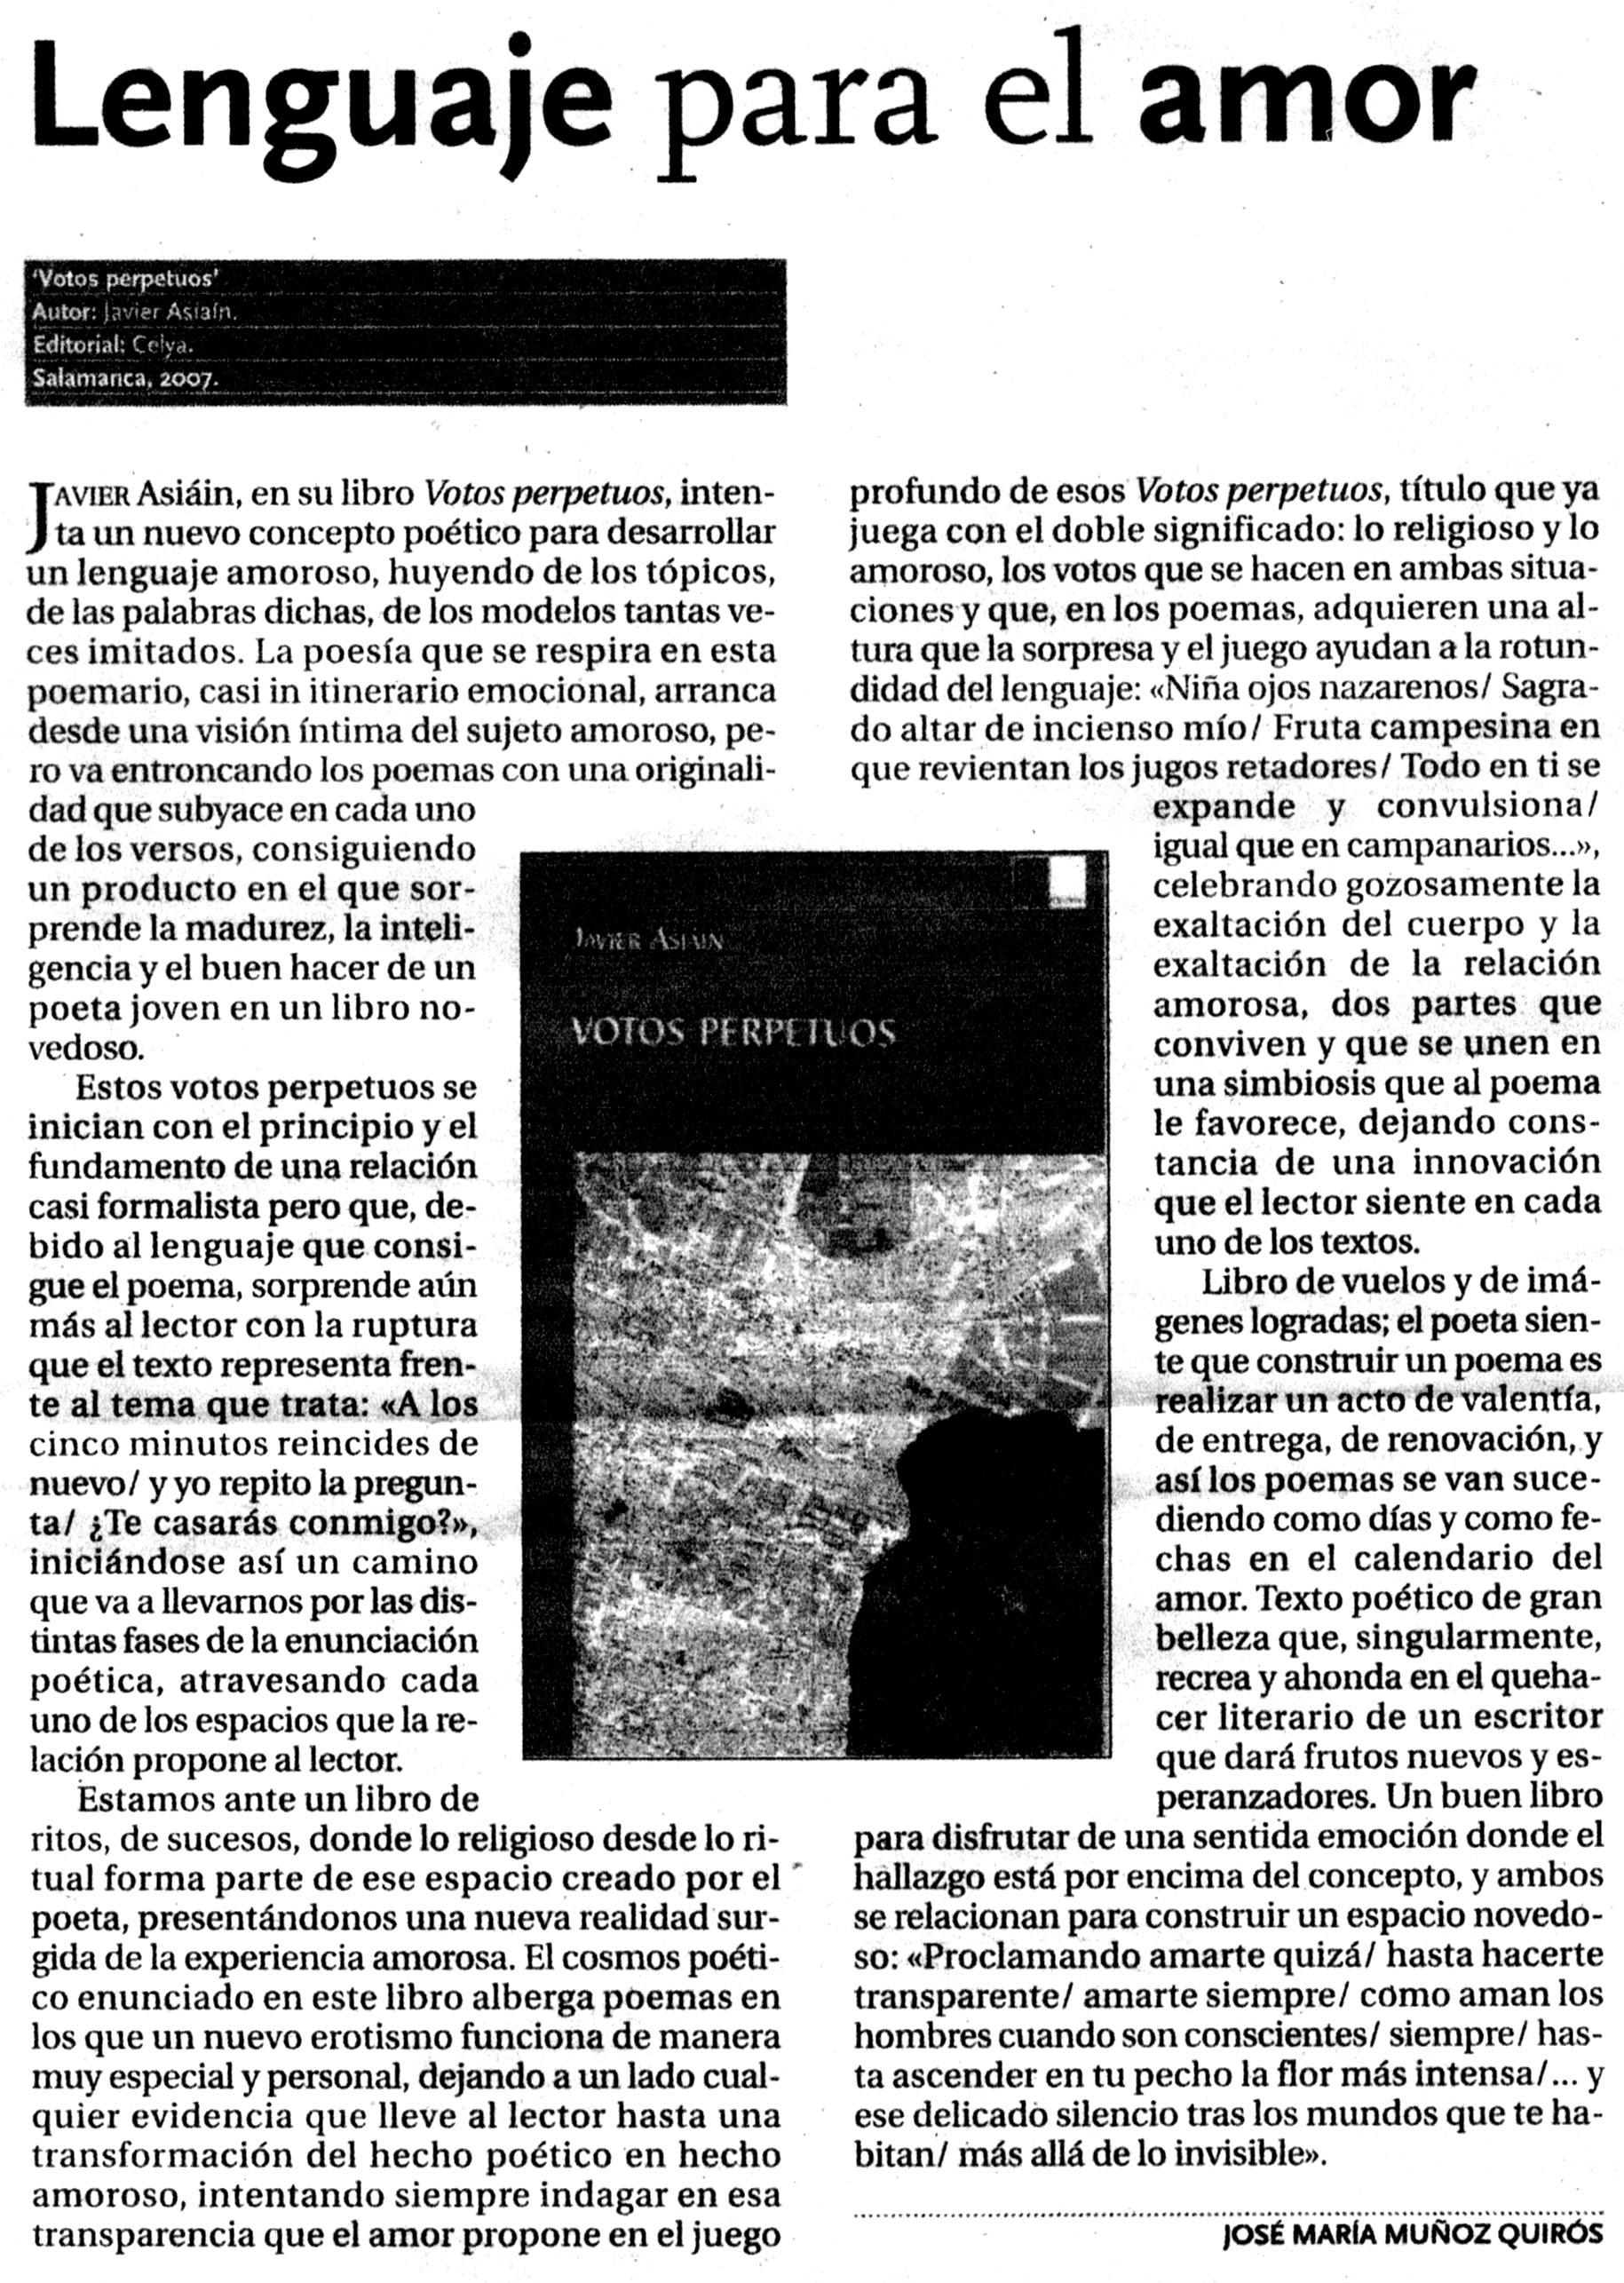 DIARIO DE ÁVILA: Votos perpetuos, de Javier Asiáin.